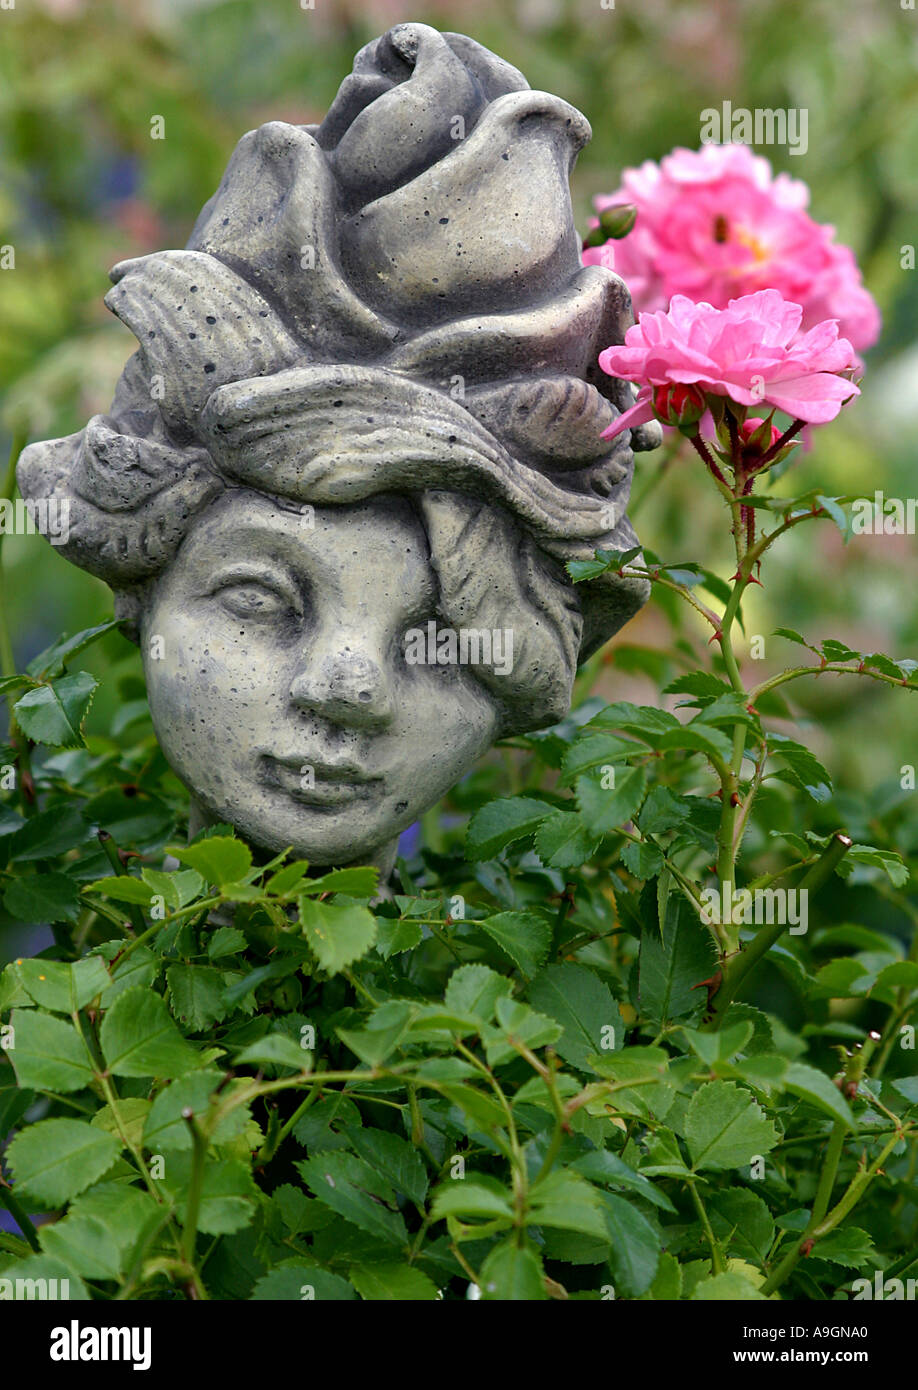 garden decoration, statue besides wild rose - Stock Image